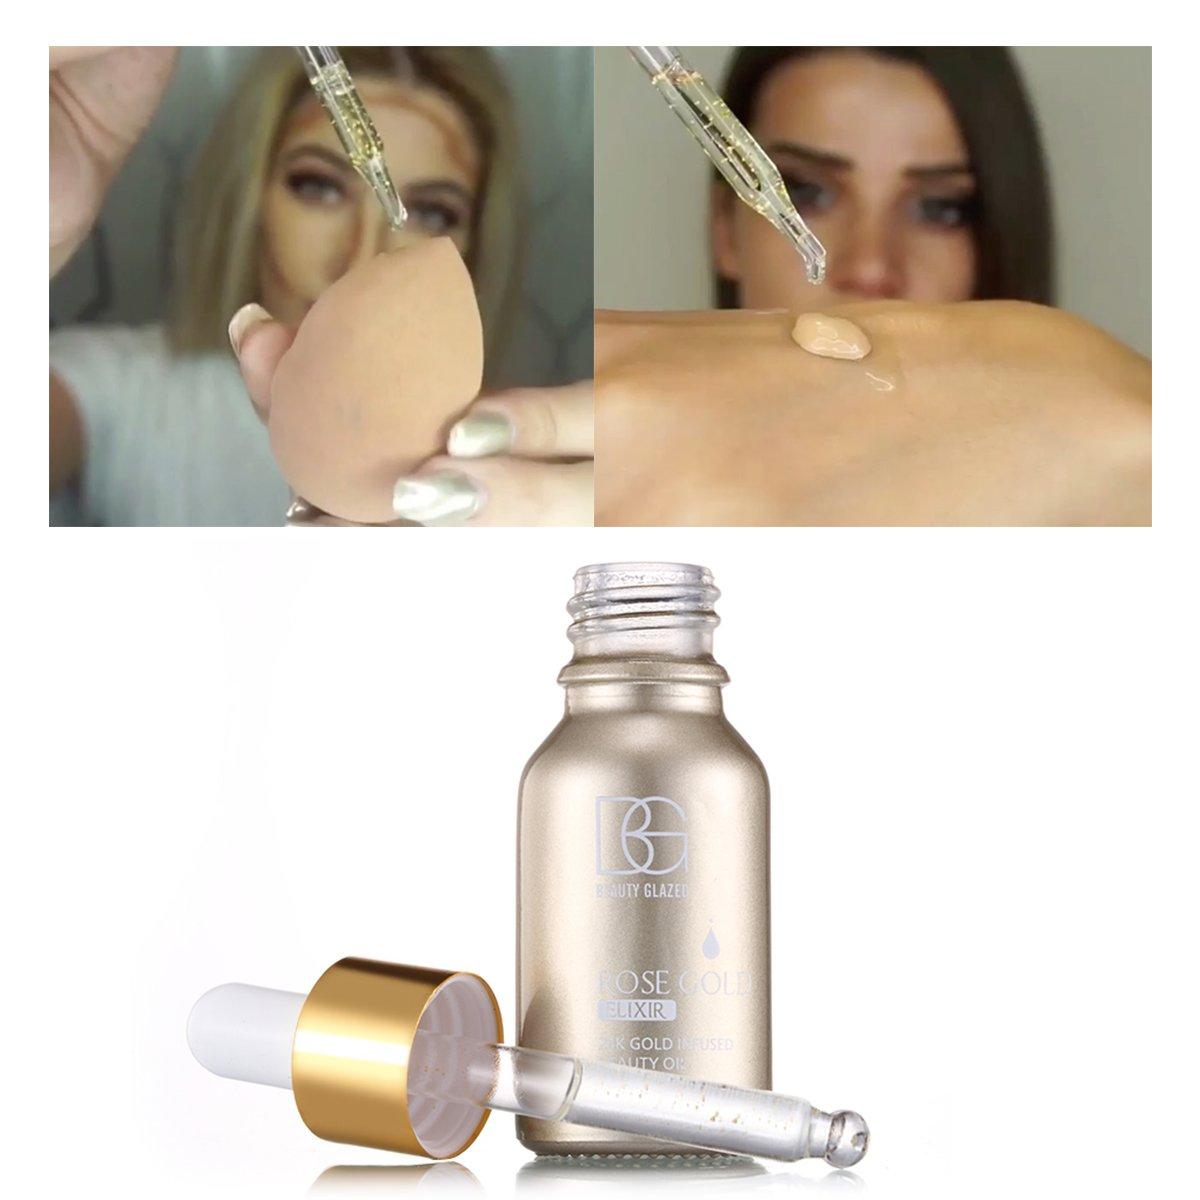 Beauty Glazed 24K GOLD INFUSED BEAUTY OIL Primer Foundation Rich in Vitamin A&E Moisturizing Anti-Aging Acne Treament acido